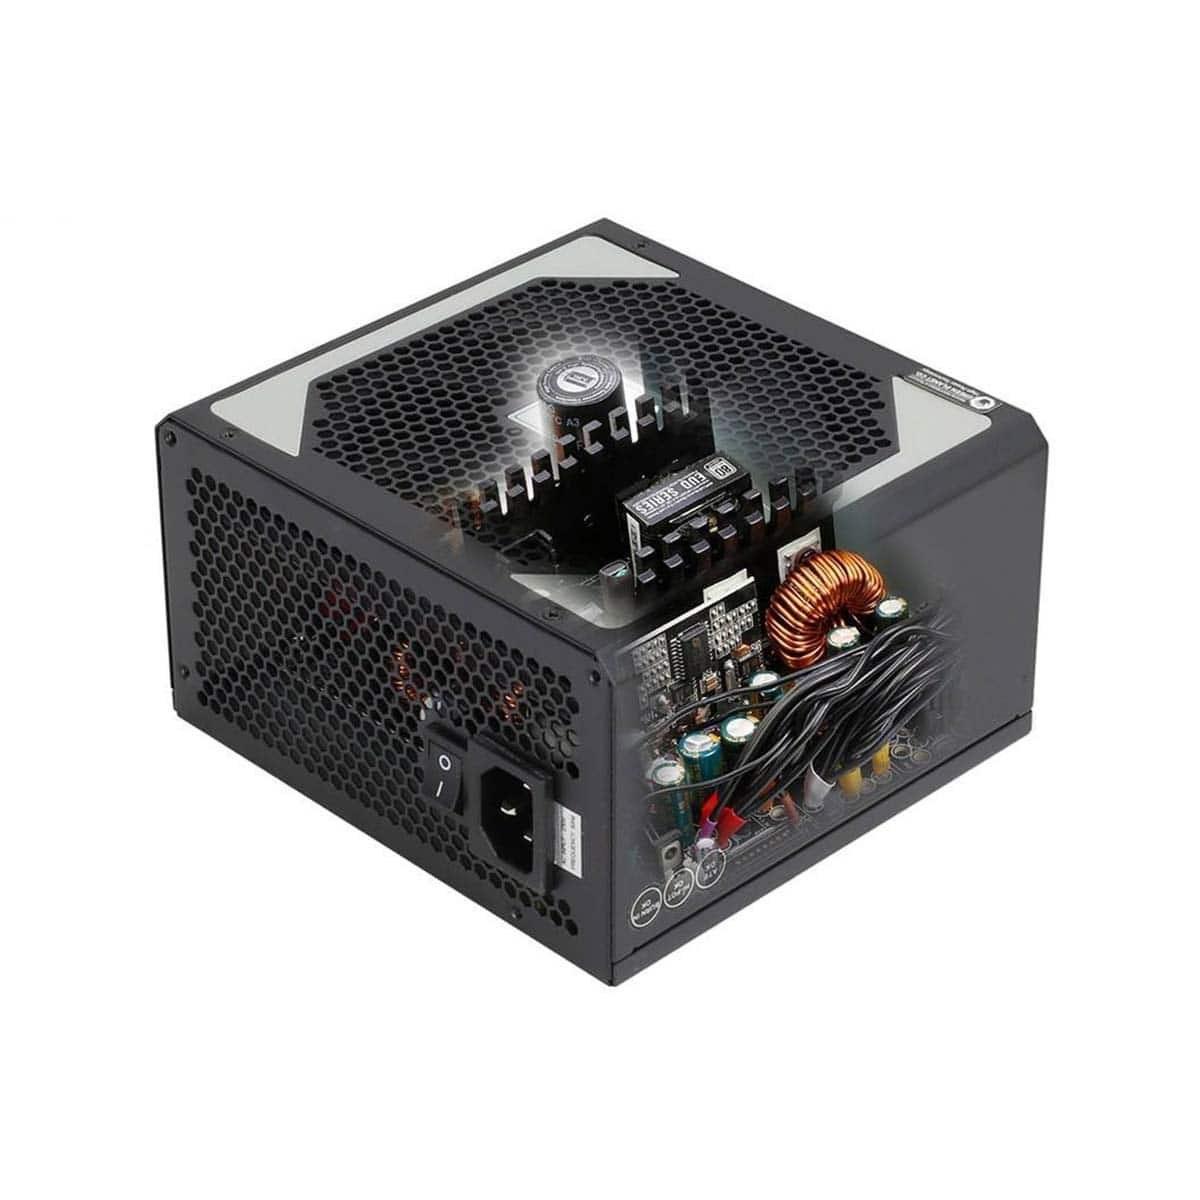 تصویر منبع تغذیه کامپیوتر گرین مدل GP580A-EUD Green GP580A-EUD Computer Power Supply